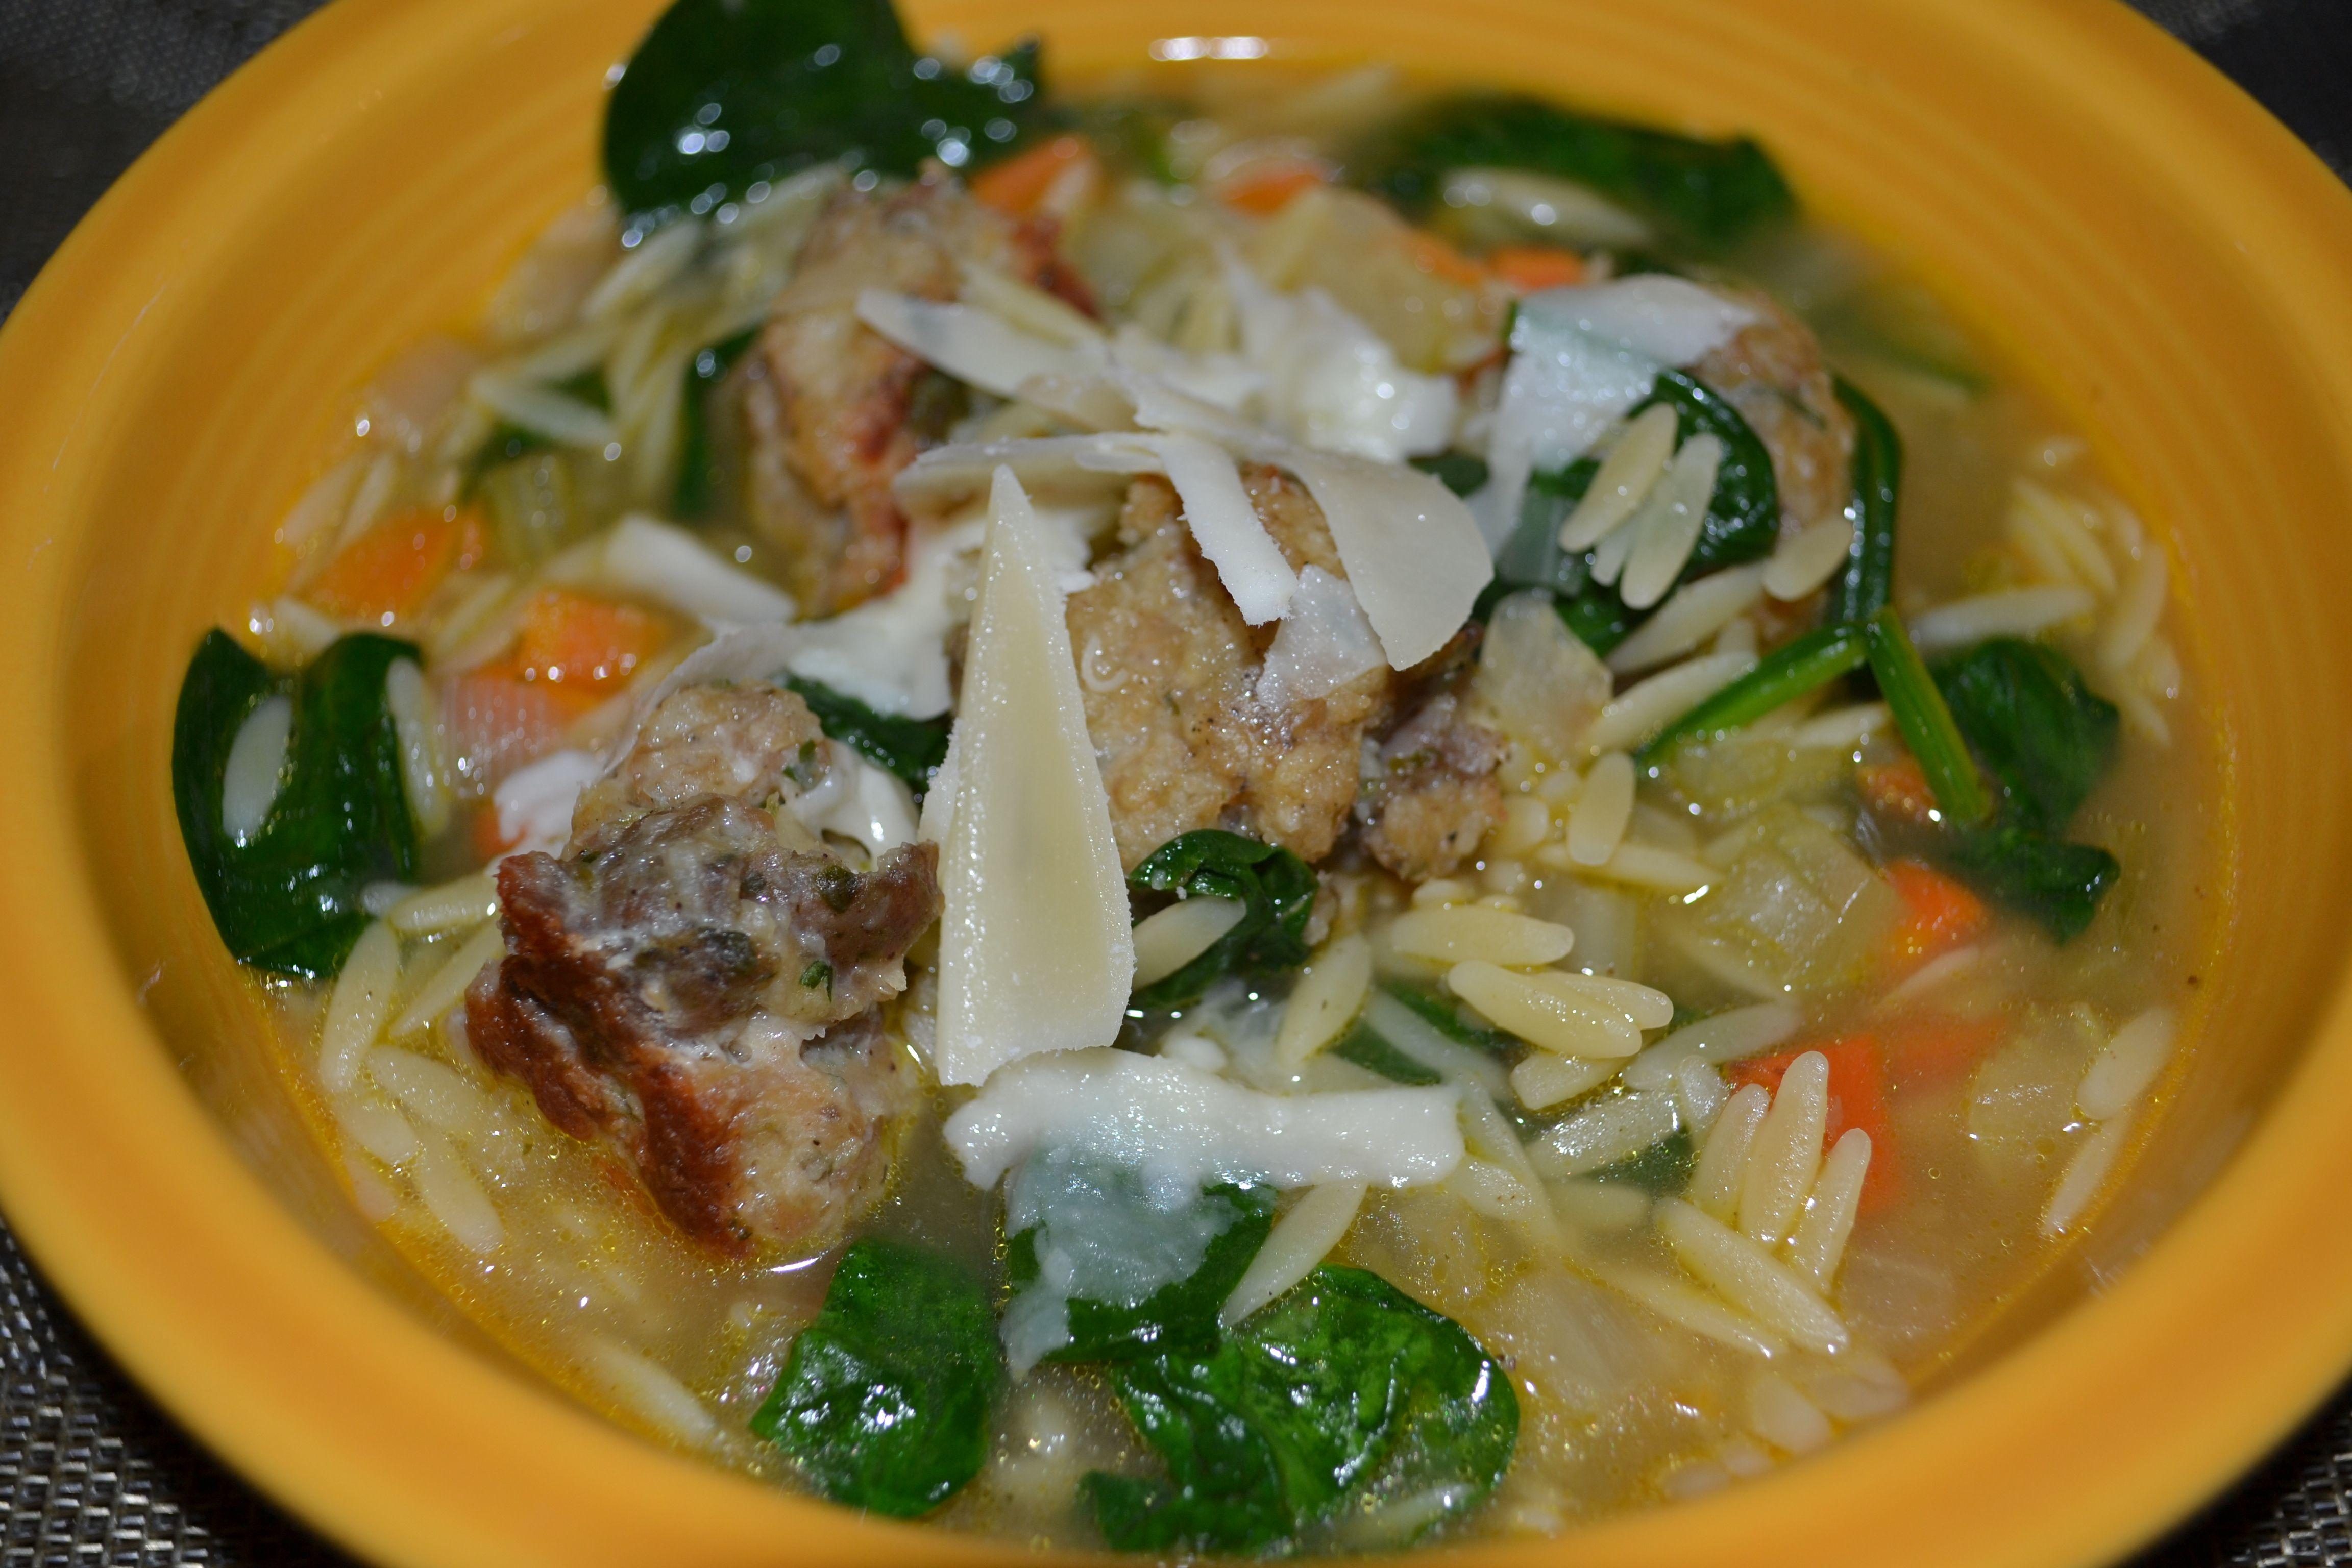 Italian Wedding Soup Italian wedding soup, Wedding soup